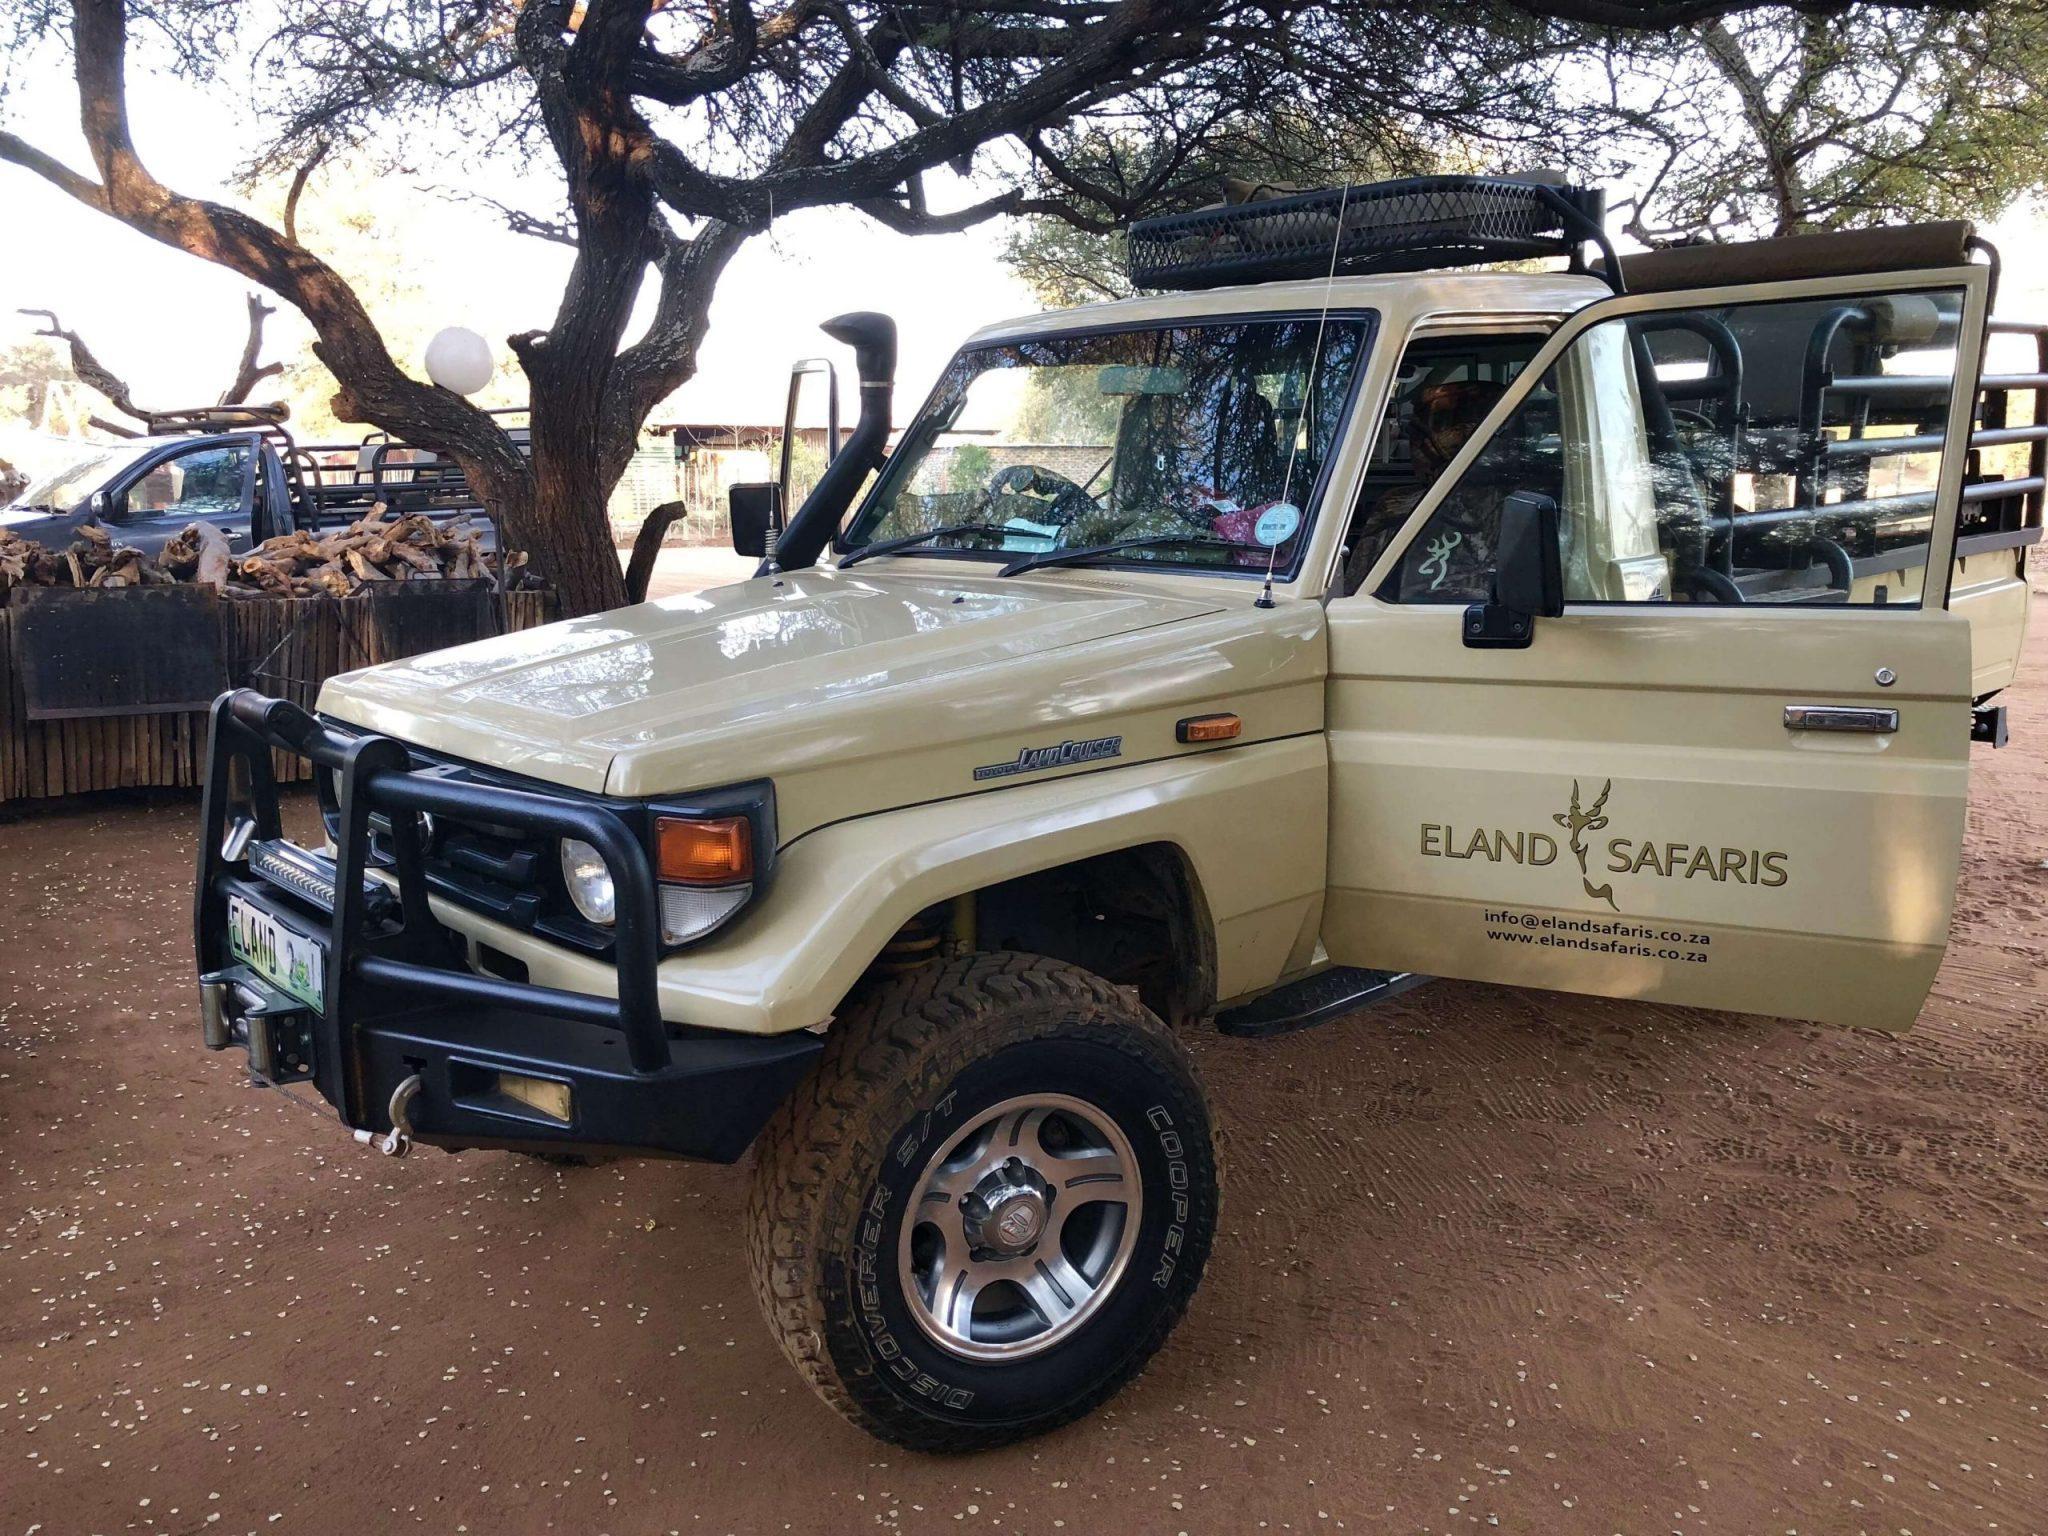 Eland Safaris